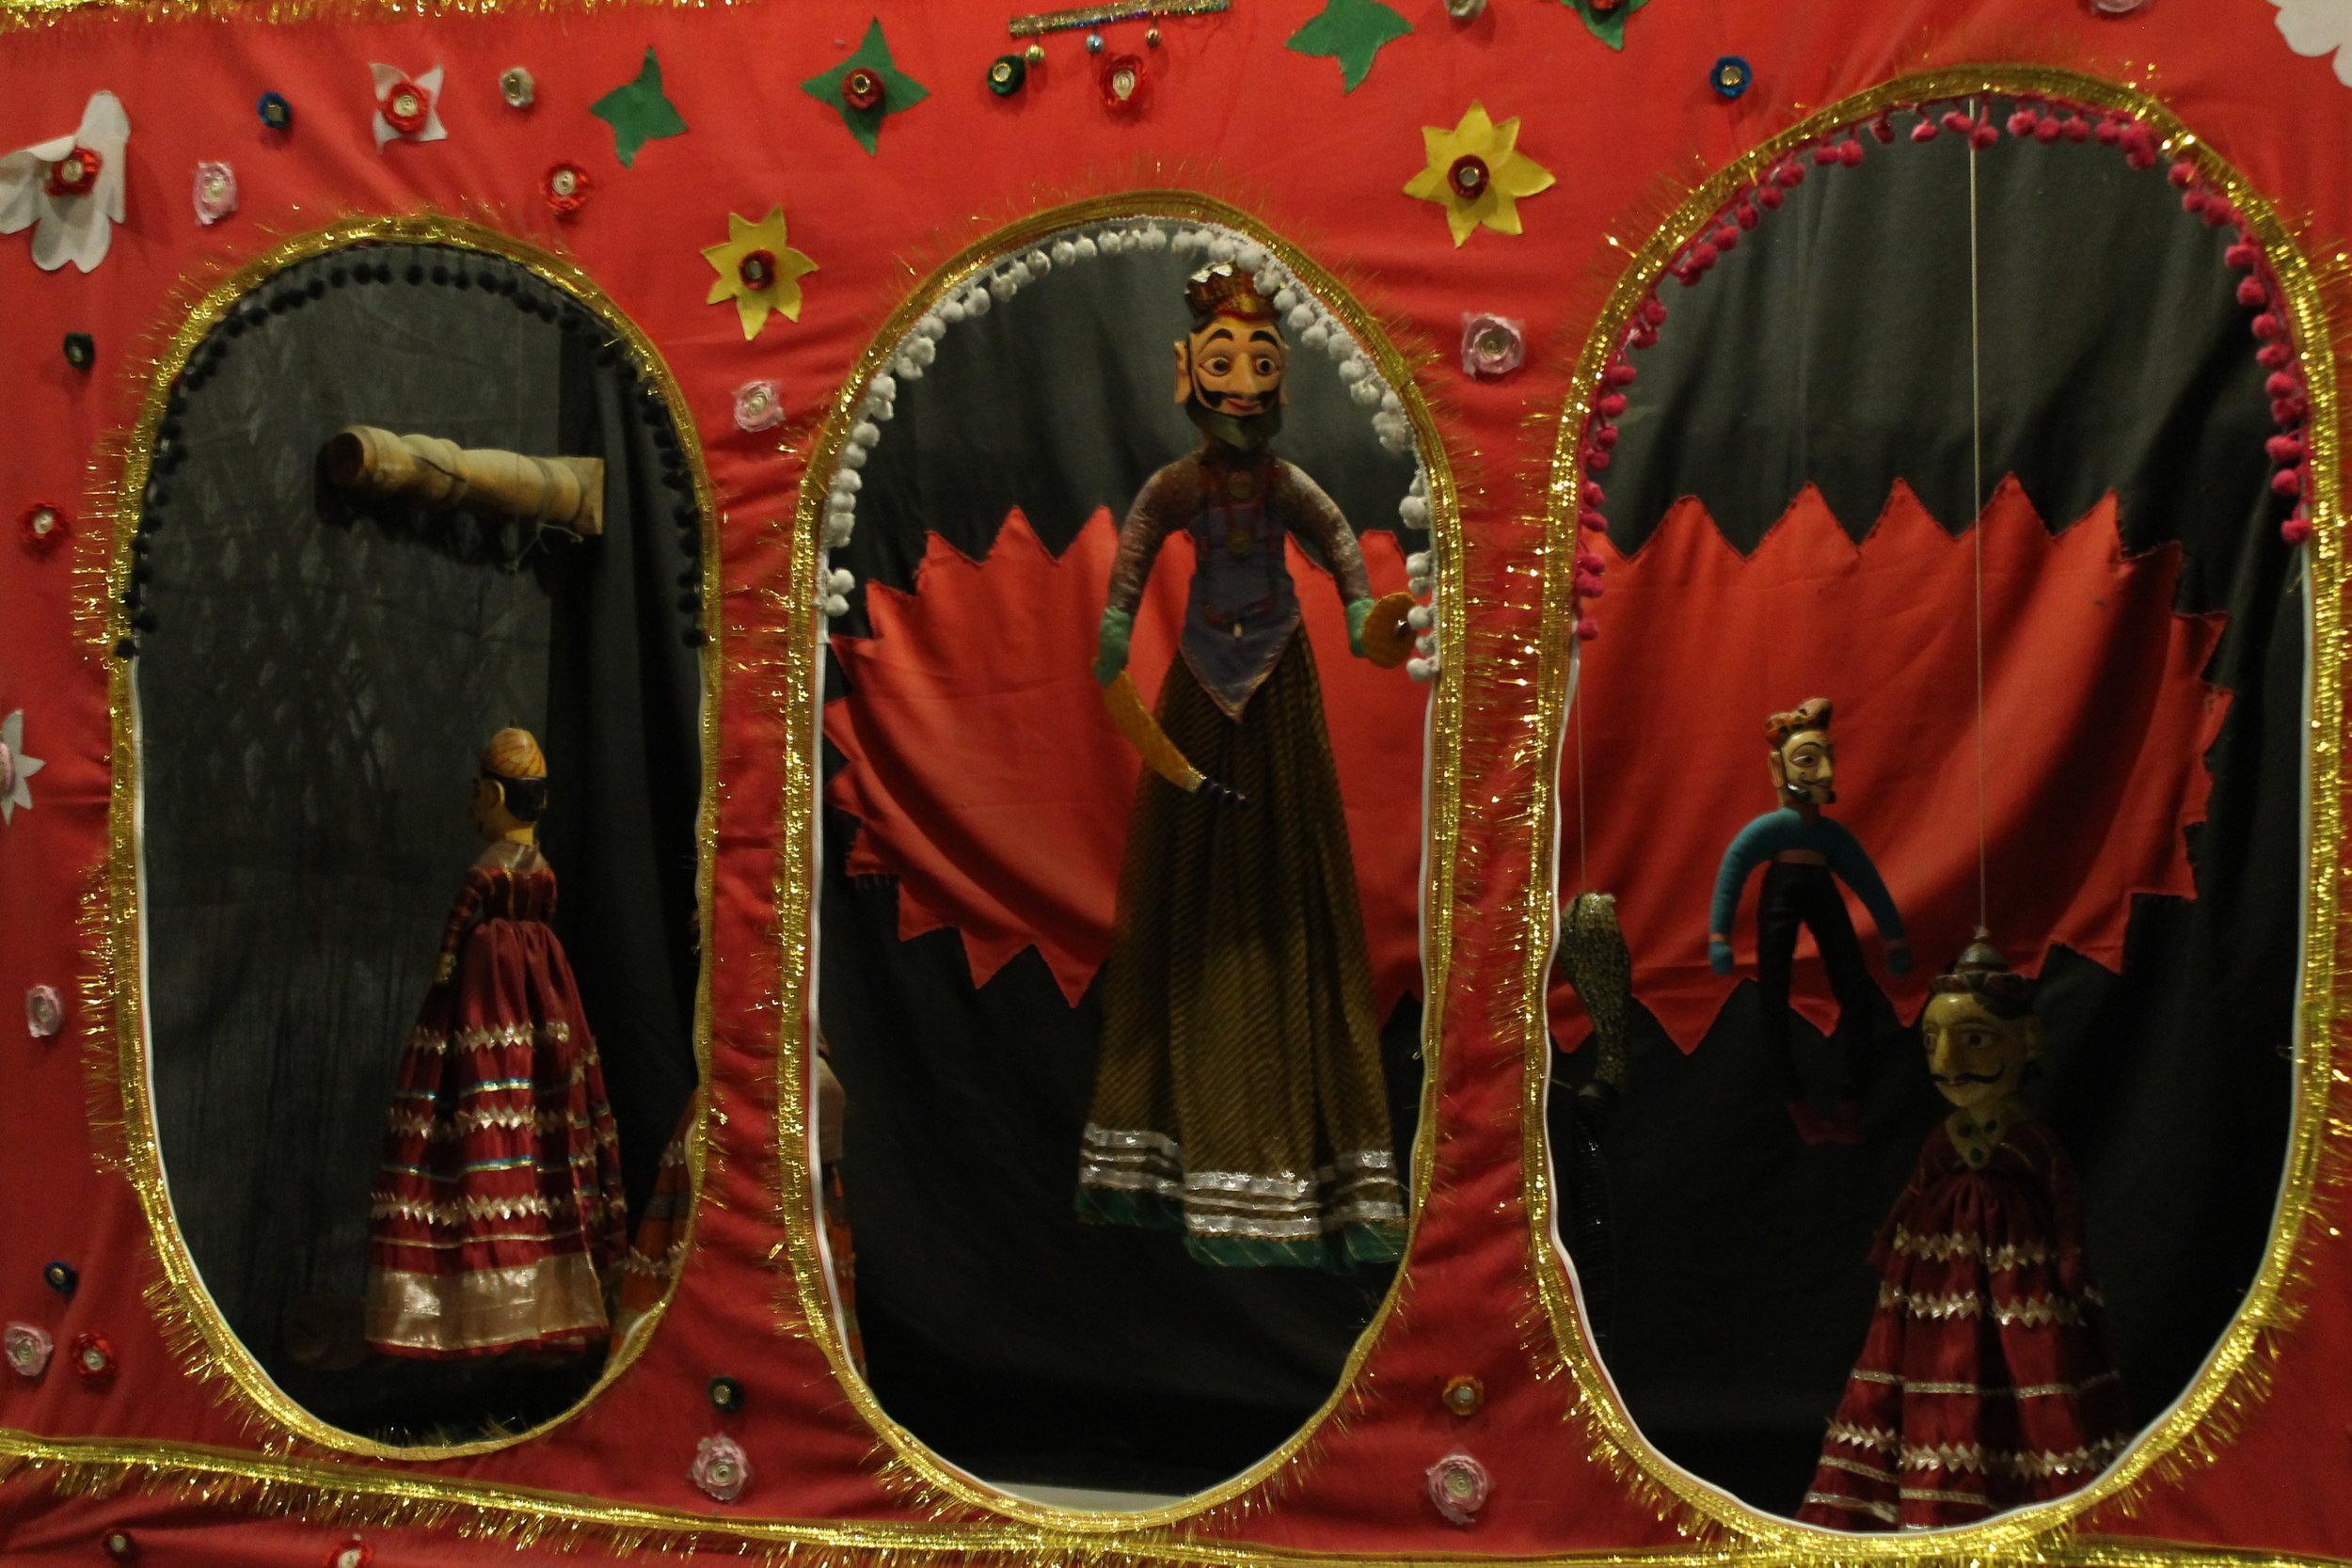 Folk puppetry exhibit at the Lok Virsa Museum